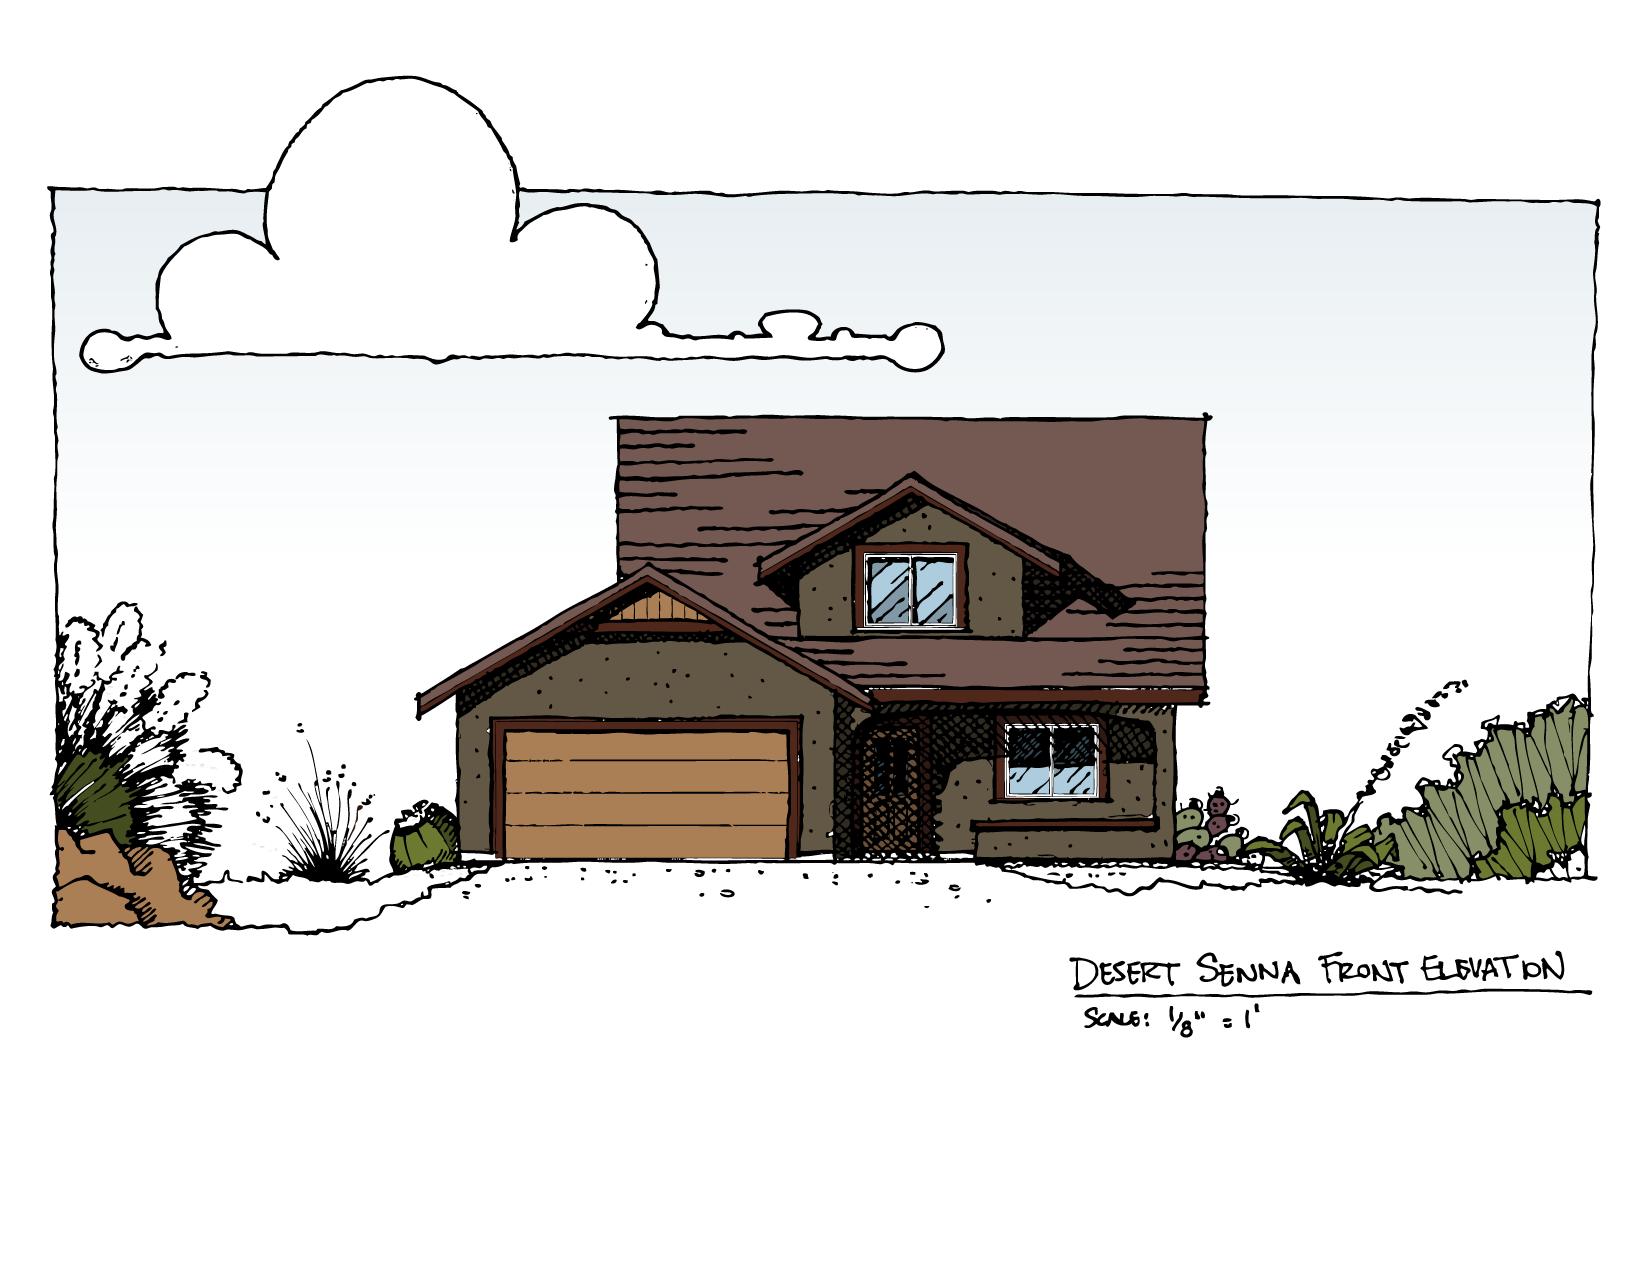 Front Elevation of Desert Senna House Plan